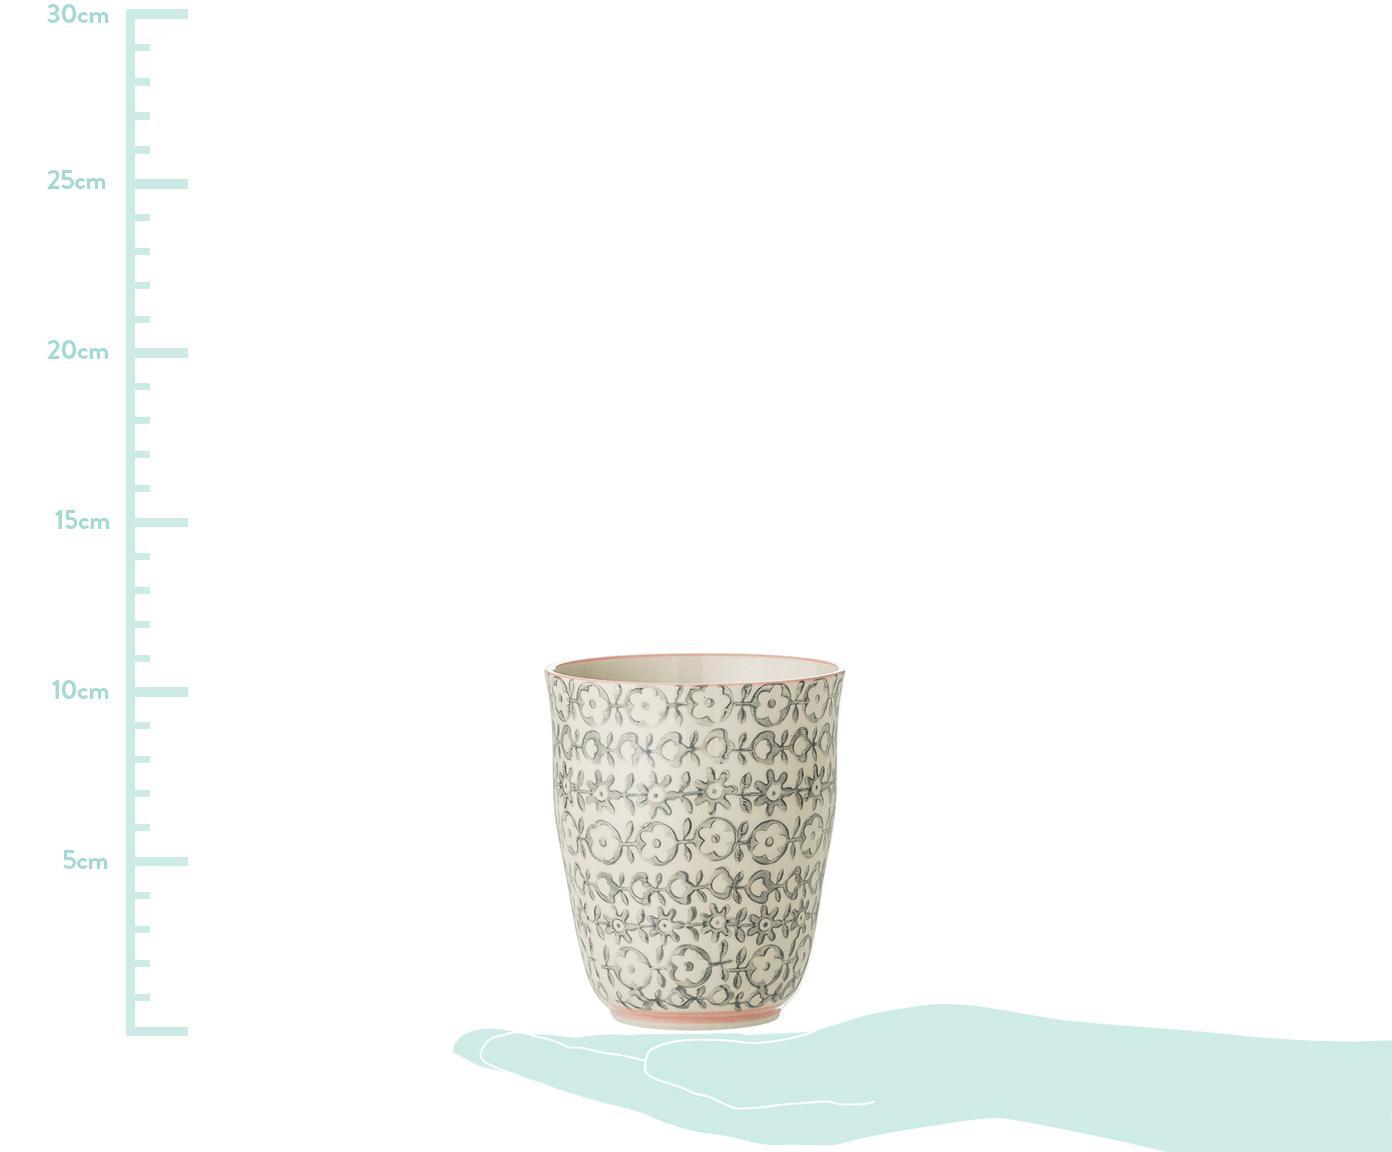 Becher Cécile mit kleinem Muster, 3er-Set, Steingut, Mehrfarbig, Ø 9 x H 10 cm